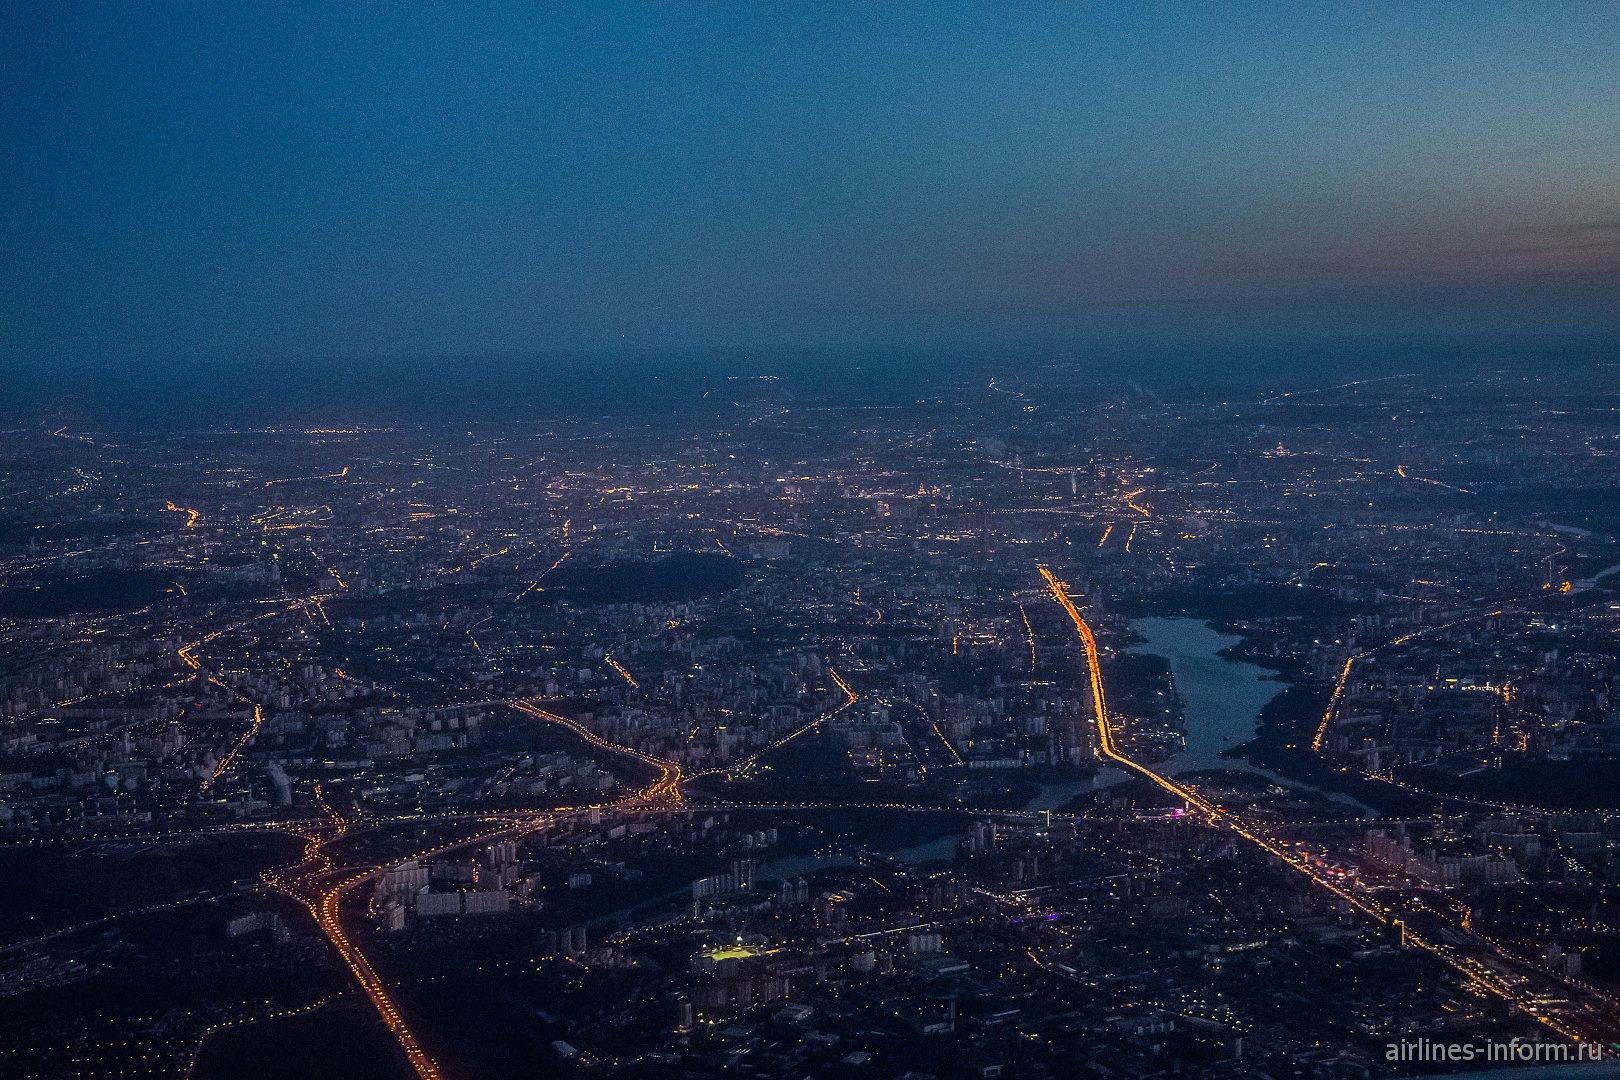 Вид на вечернюю Москву перед посадкой в Шереметьево